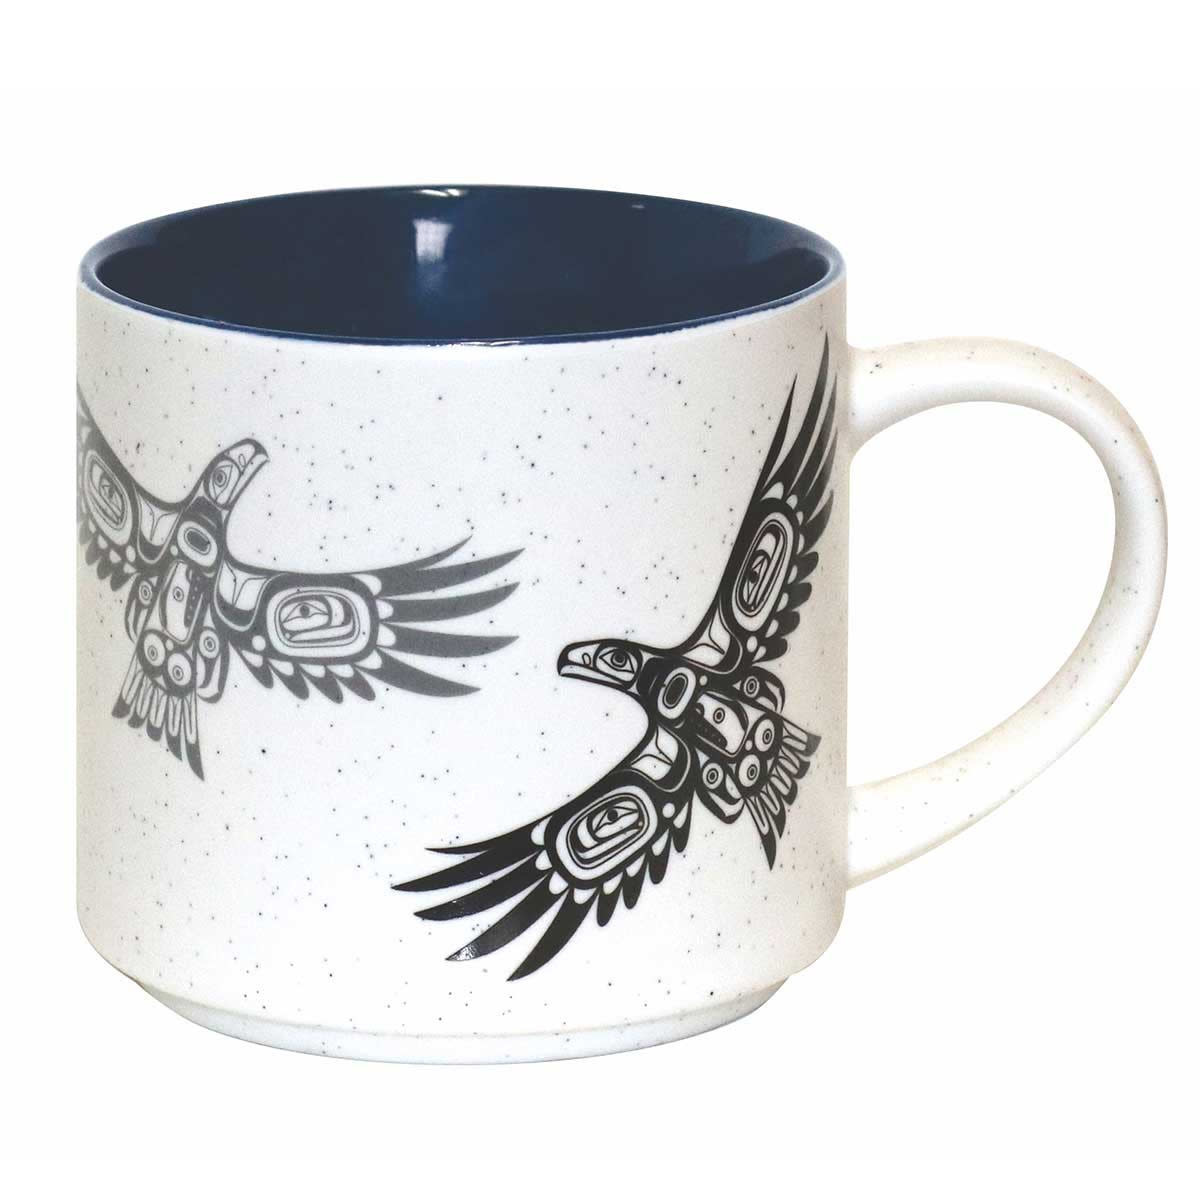 16 oz Ceramic Mug-4